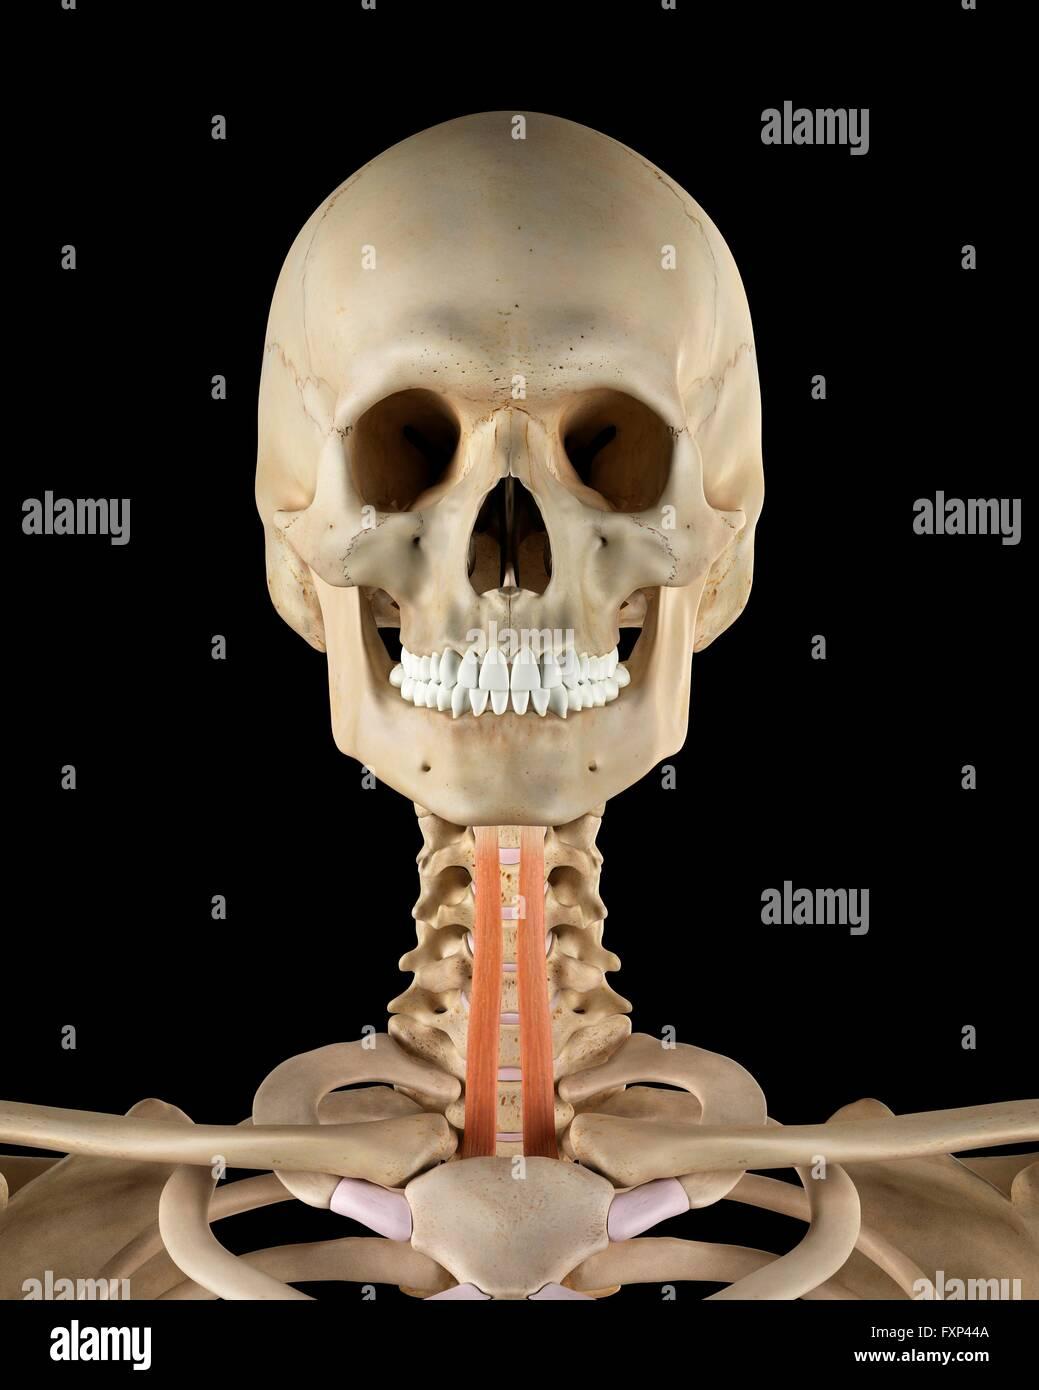 Normal Neck Bones Stock Photos Normal Neck Bones Stock Images Alamy